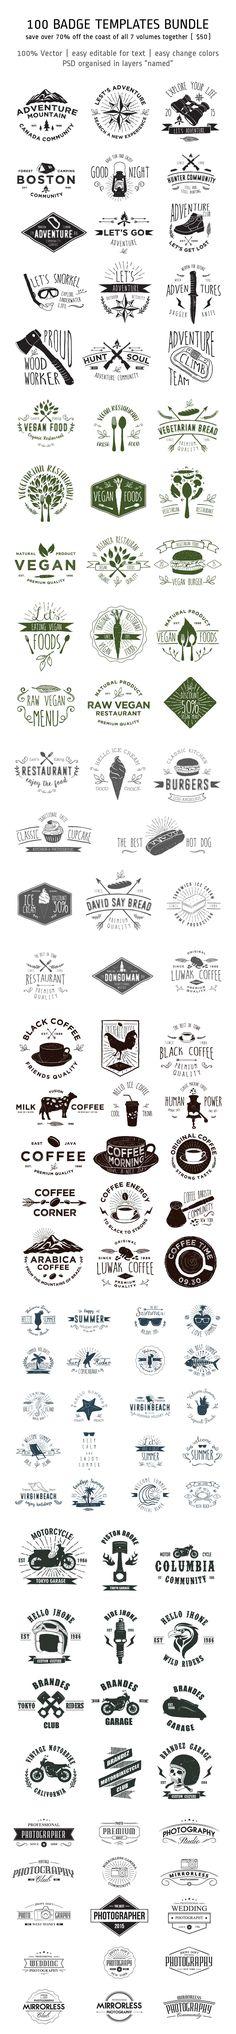 100 Badge Templates PSD, AI Bundle #design Download: https://creativemarket.com/alitdesign/302552-100-Badge-Templates-Bundle?u=ksioks